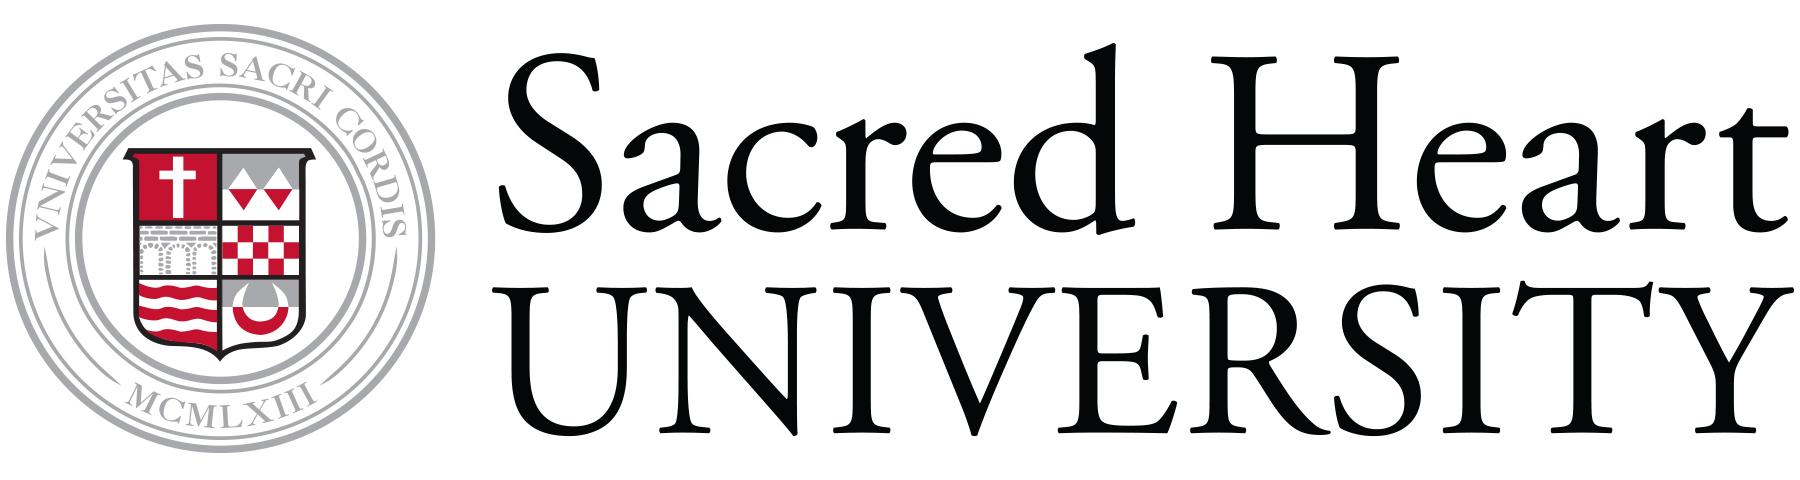 University cva program rider university sacred heart university 1betcityfo Choice Image